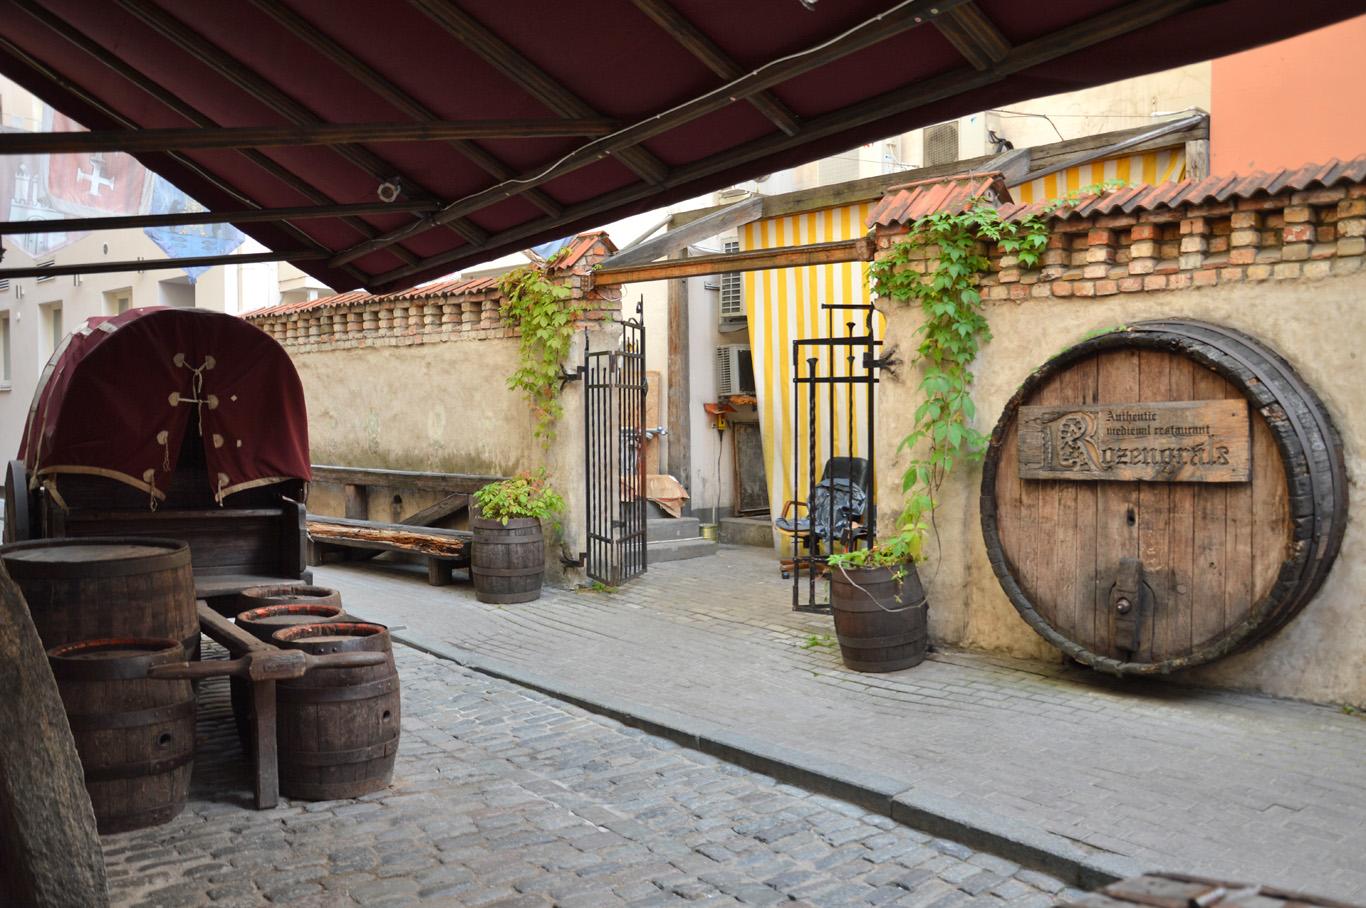 Beautiful medieval restaurant